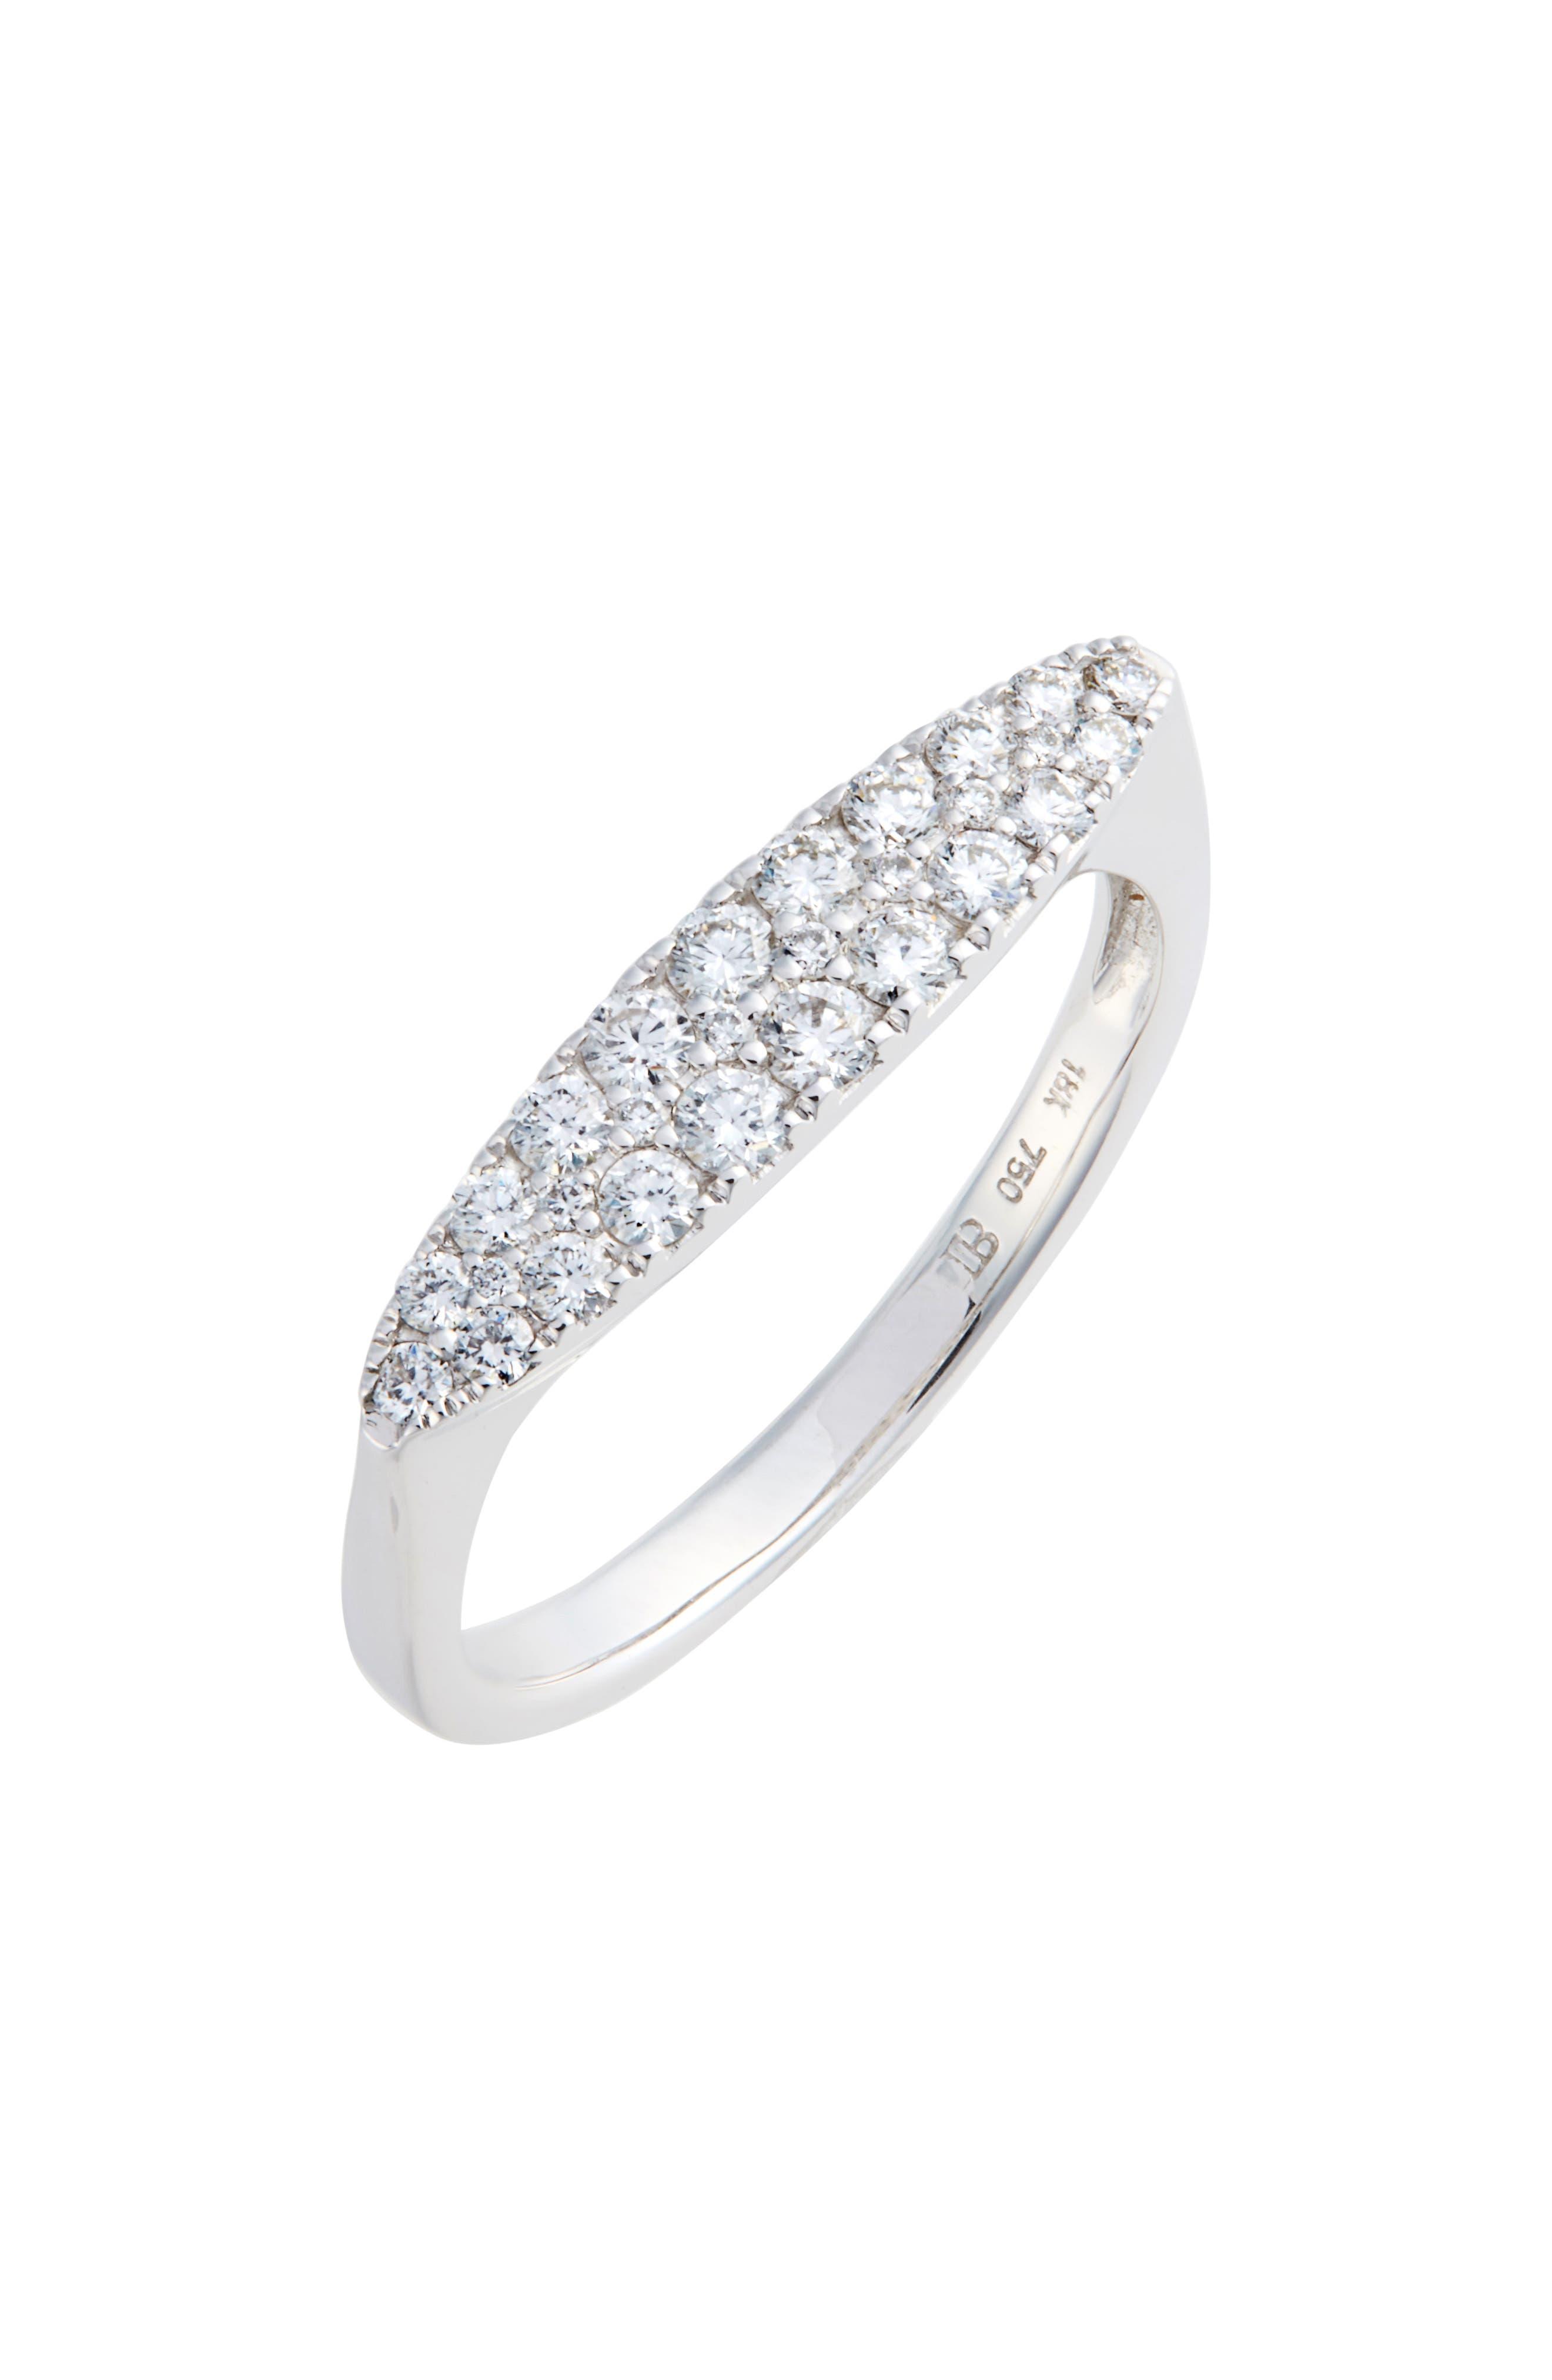 Oval Diamond Stacking Ring,                             Main thumbnail 1, color,                             WHITE GOLD/ DIAMOND